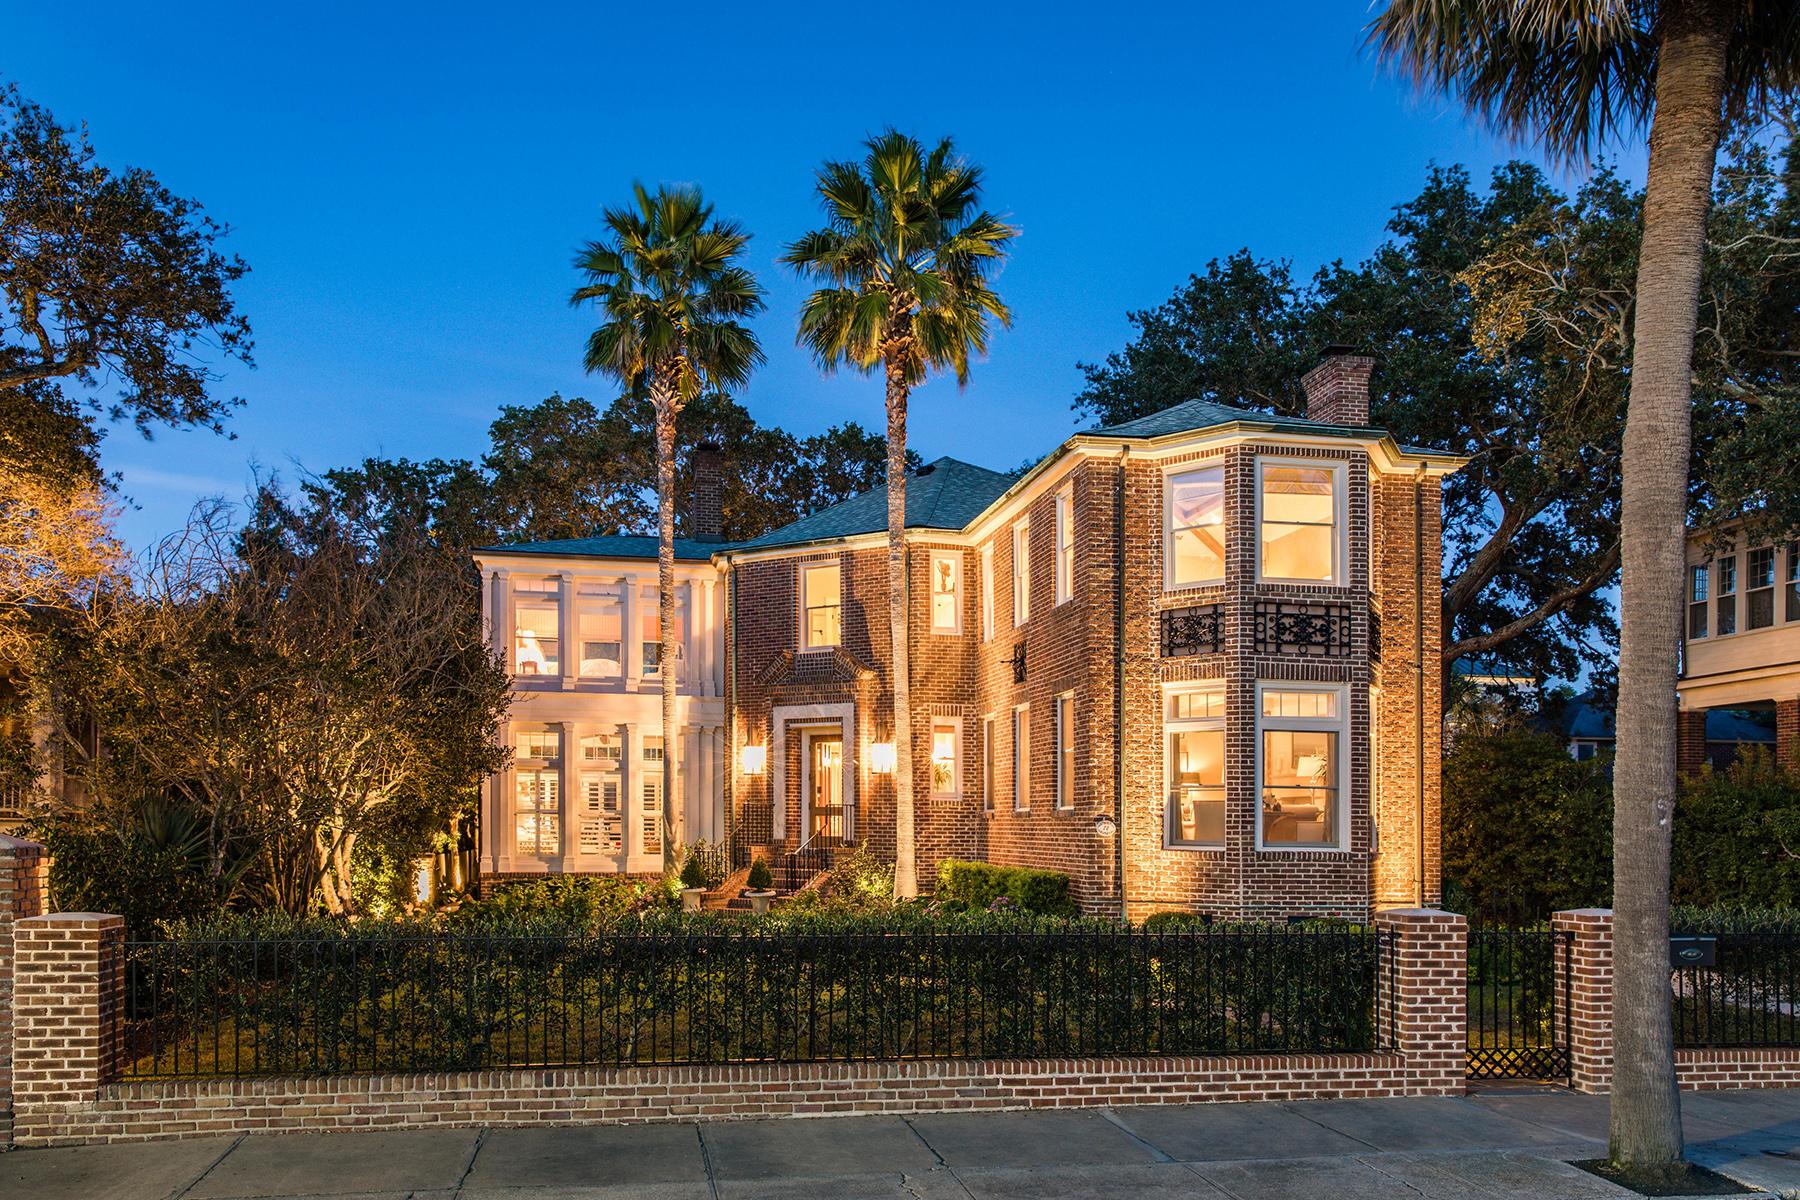 Single Family Homes for Active at 72 Murray Boulevard Charleston, South Carolina 29401 United States